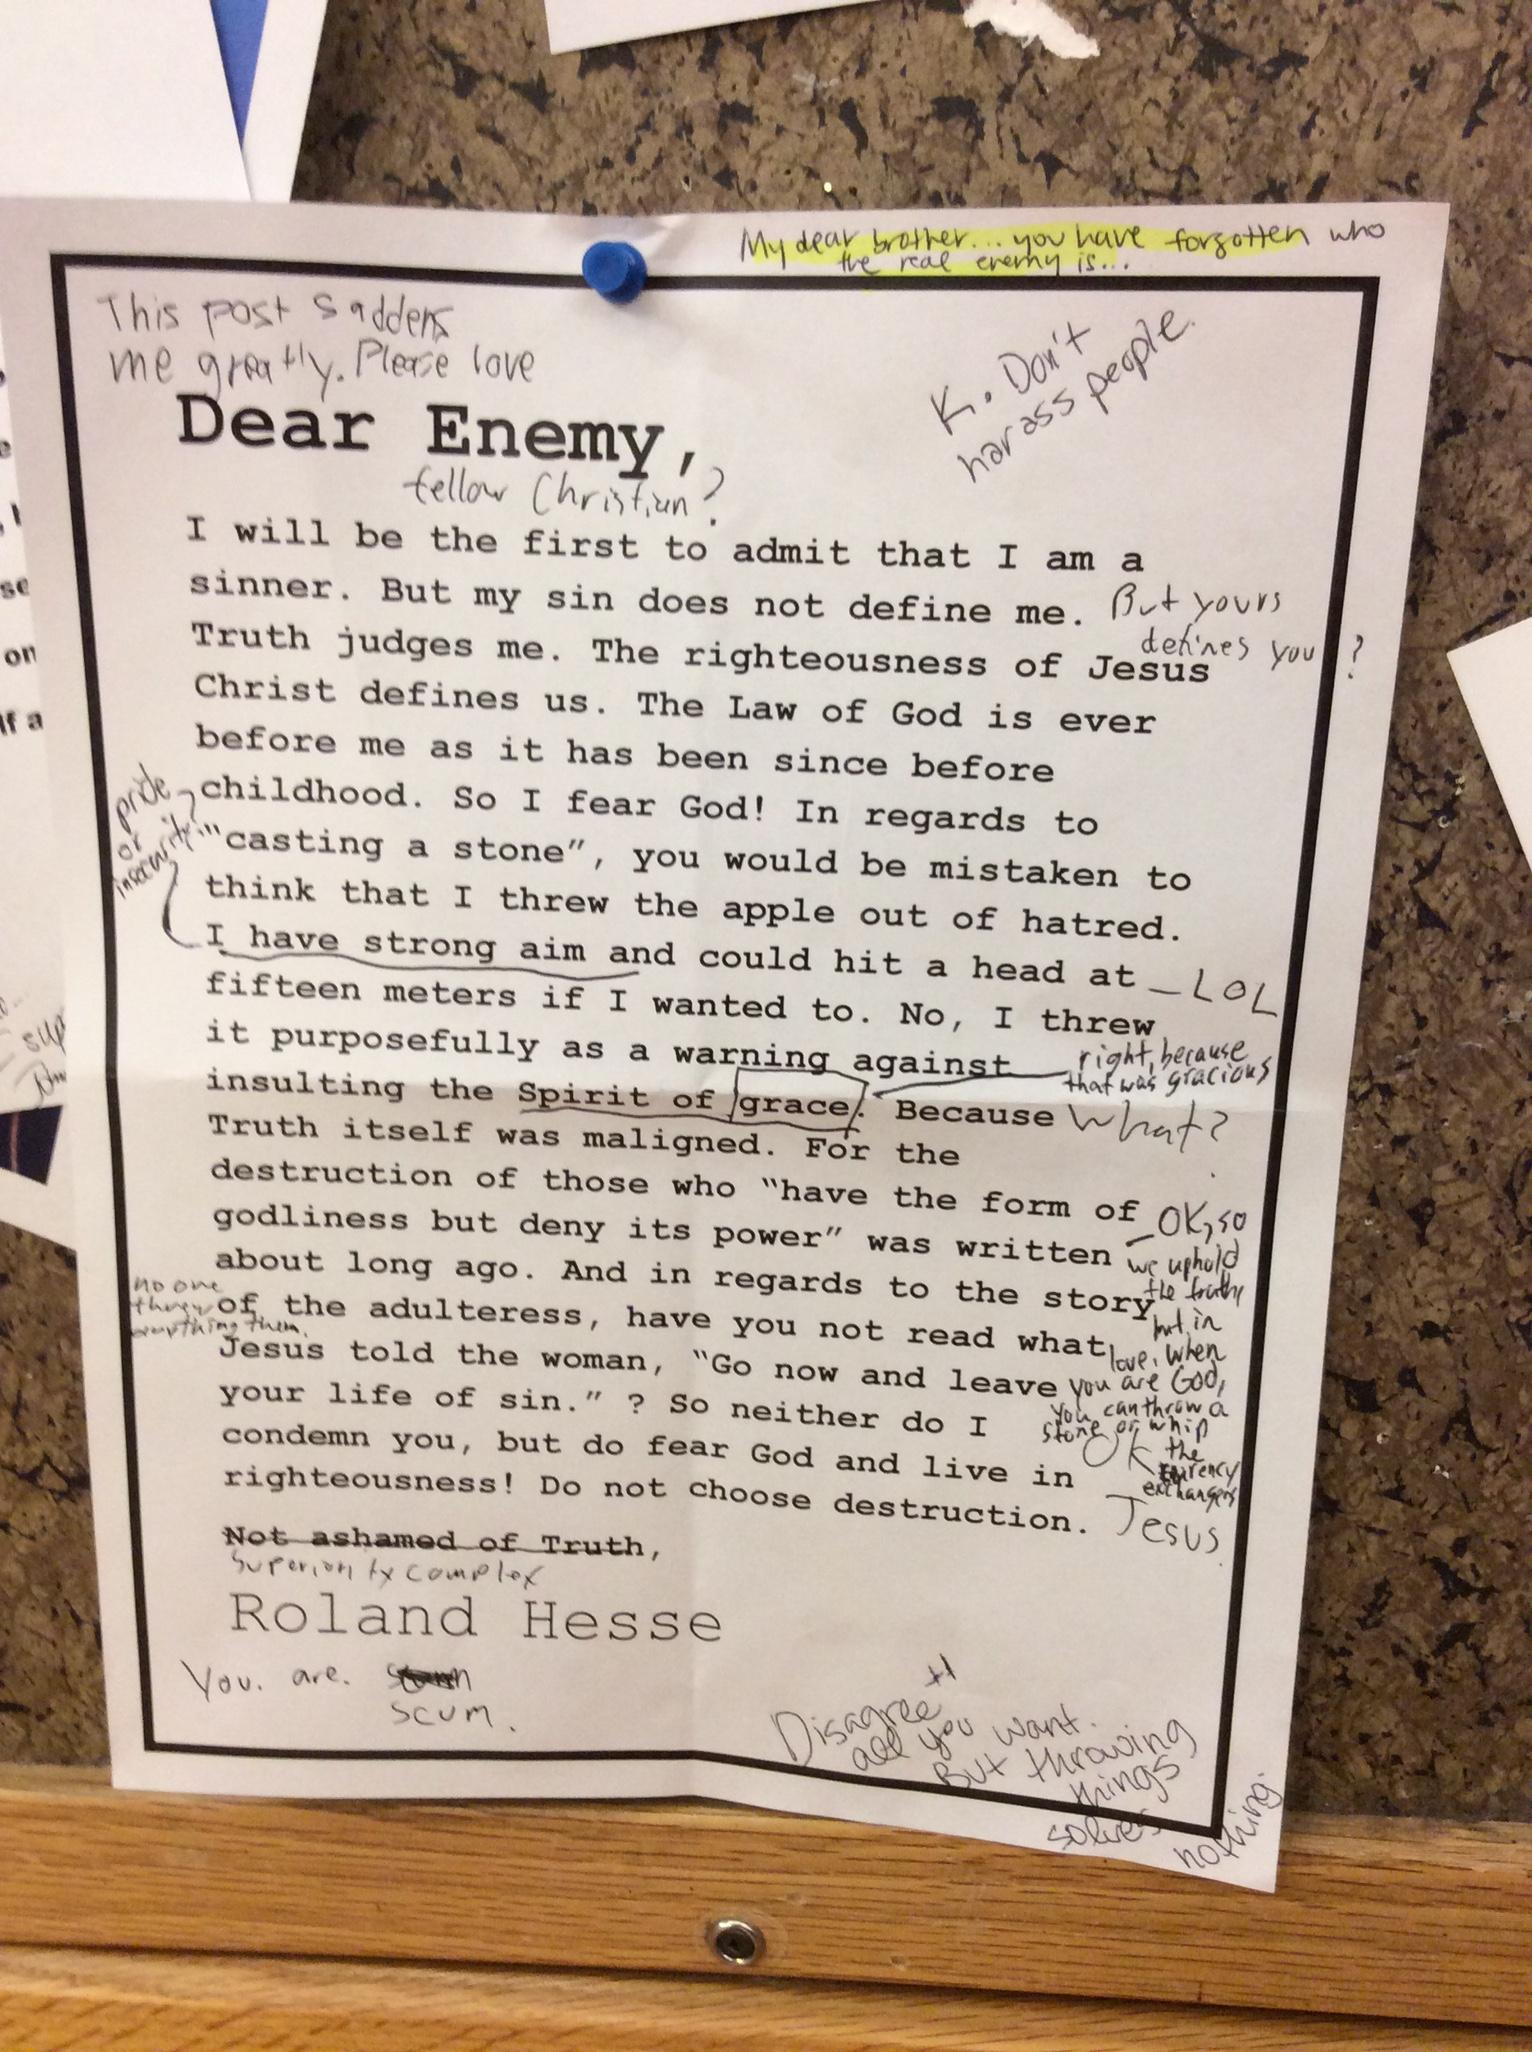 A note on a student bulletin board at Wheaton College in Wheaton, Ill., Feb. 24, 2015.